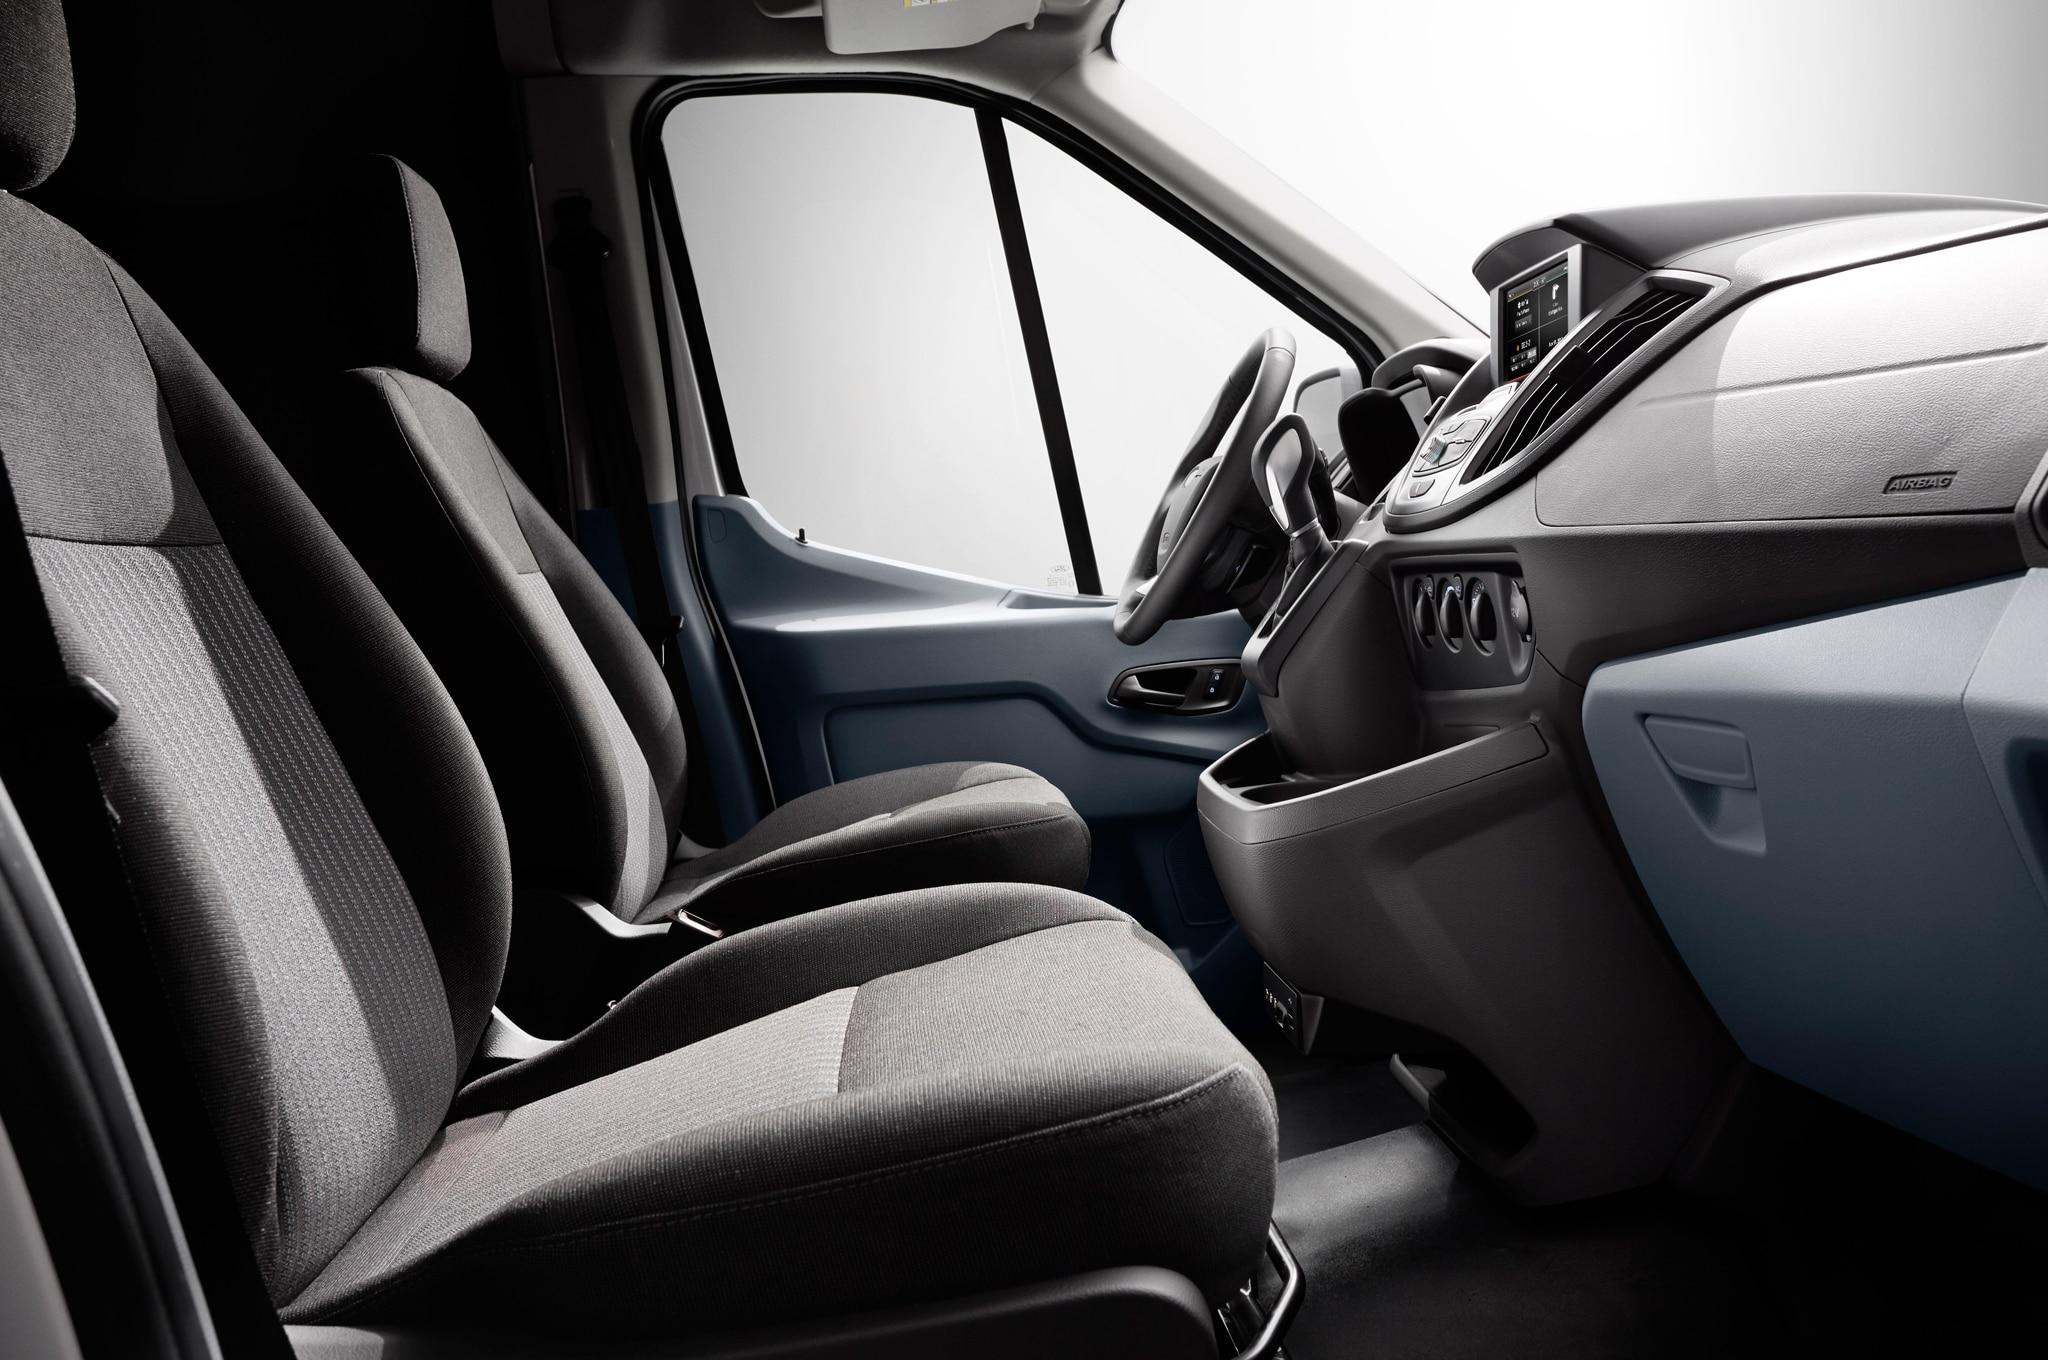 2015 Ford Transit Cargo Van Review